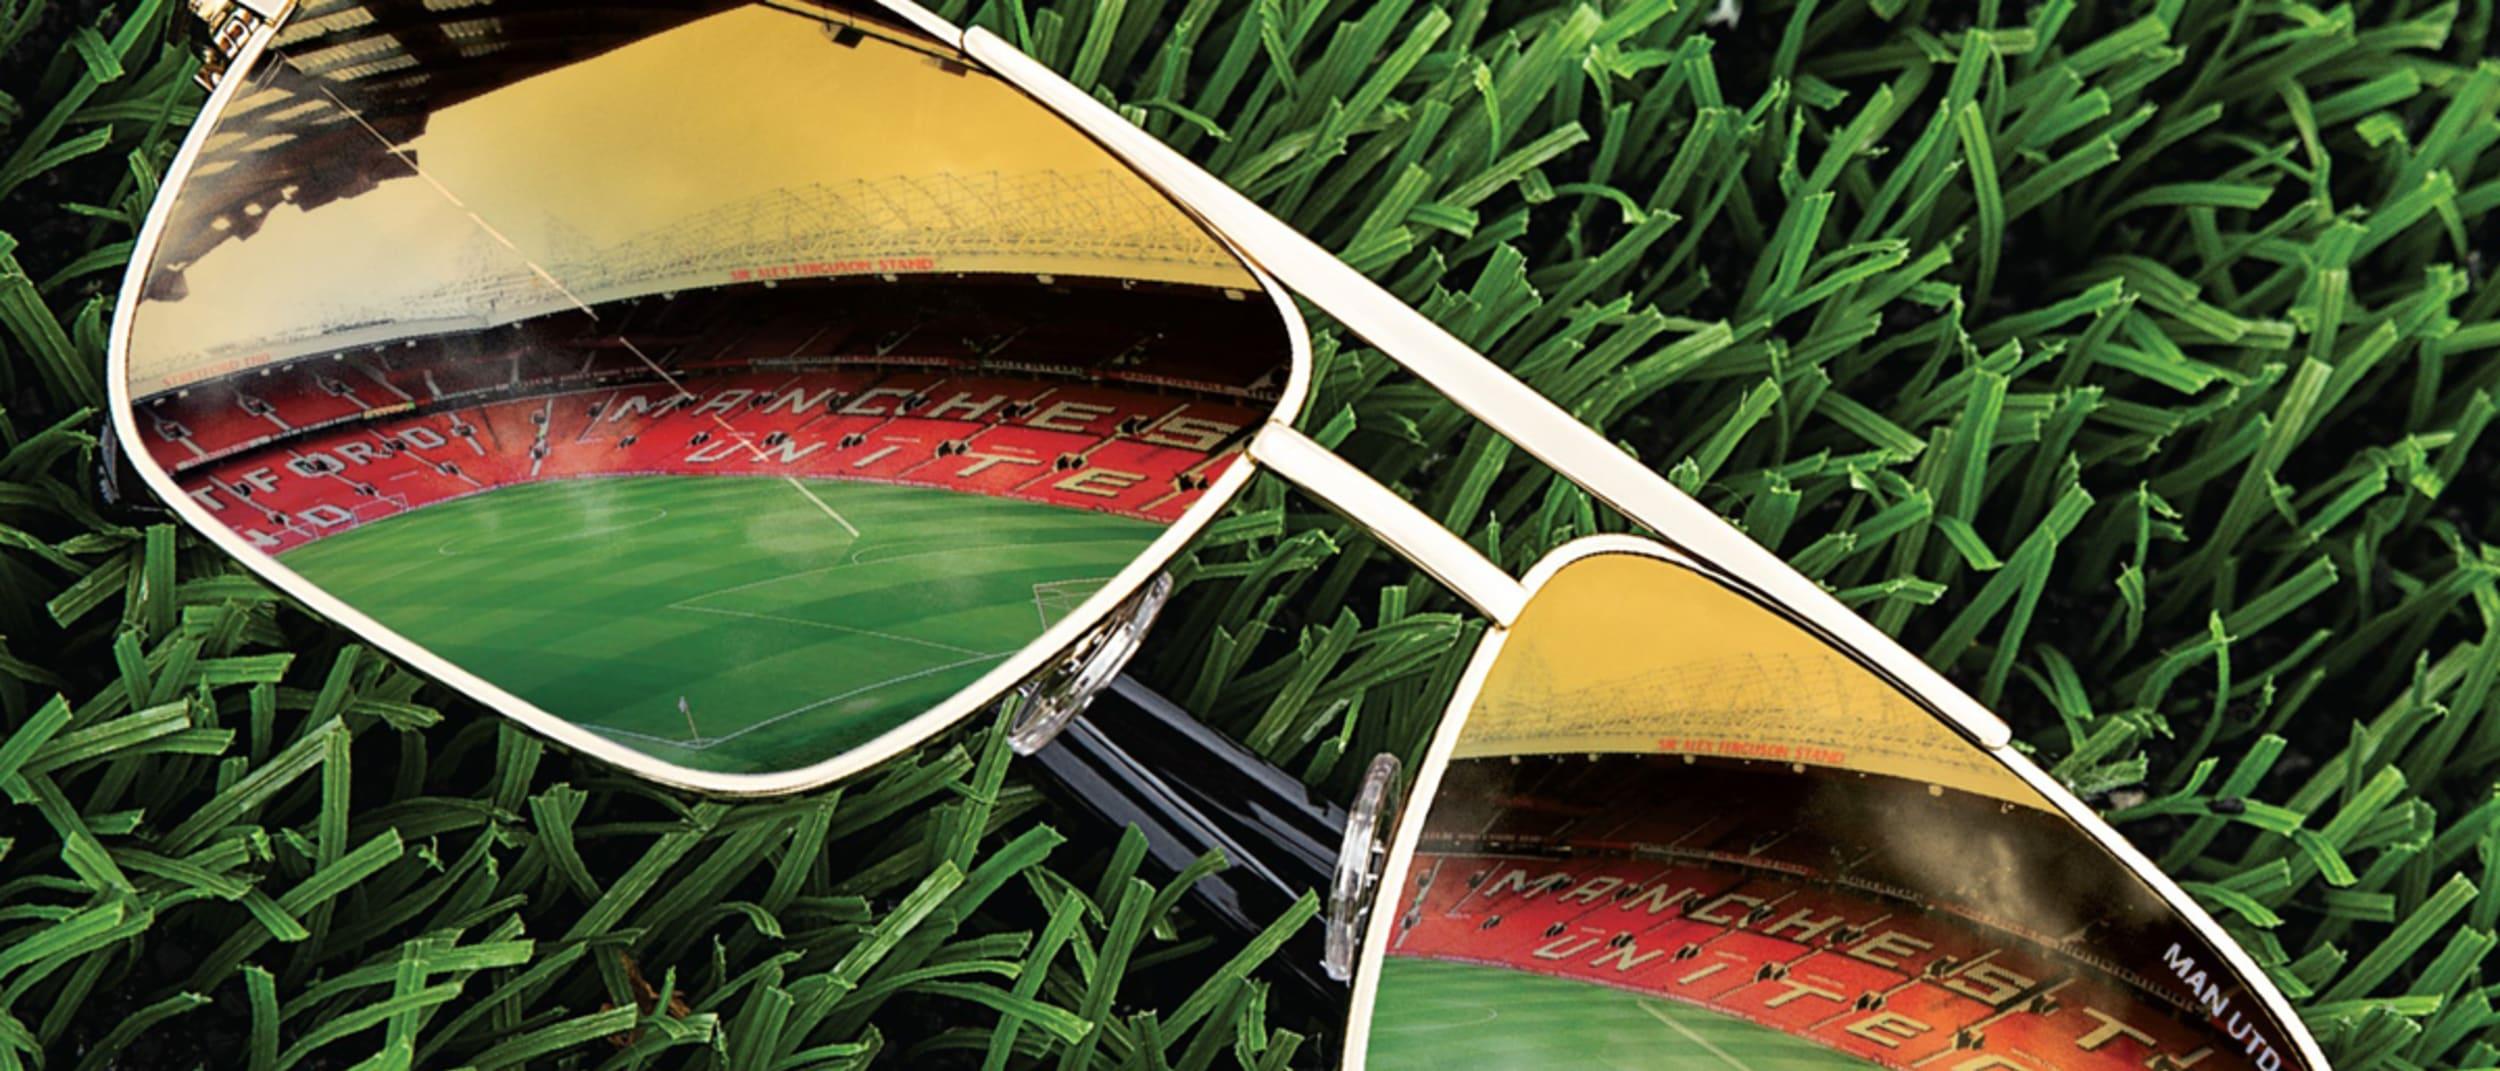 Maui Jim X Manchester United drop at Sunglass Culture